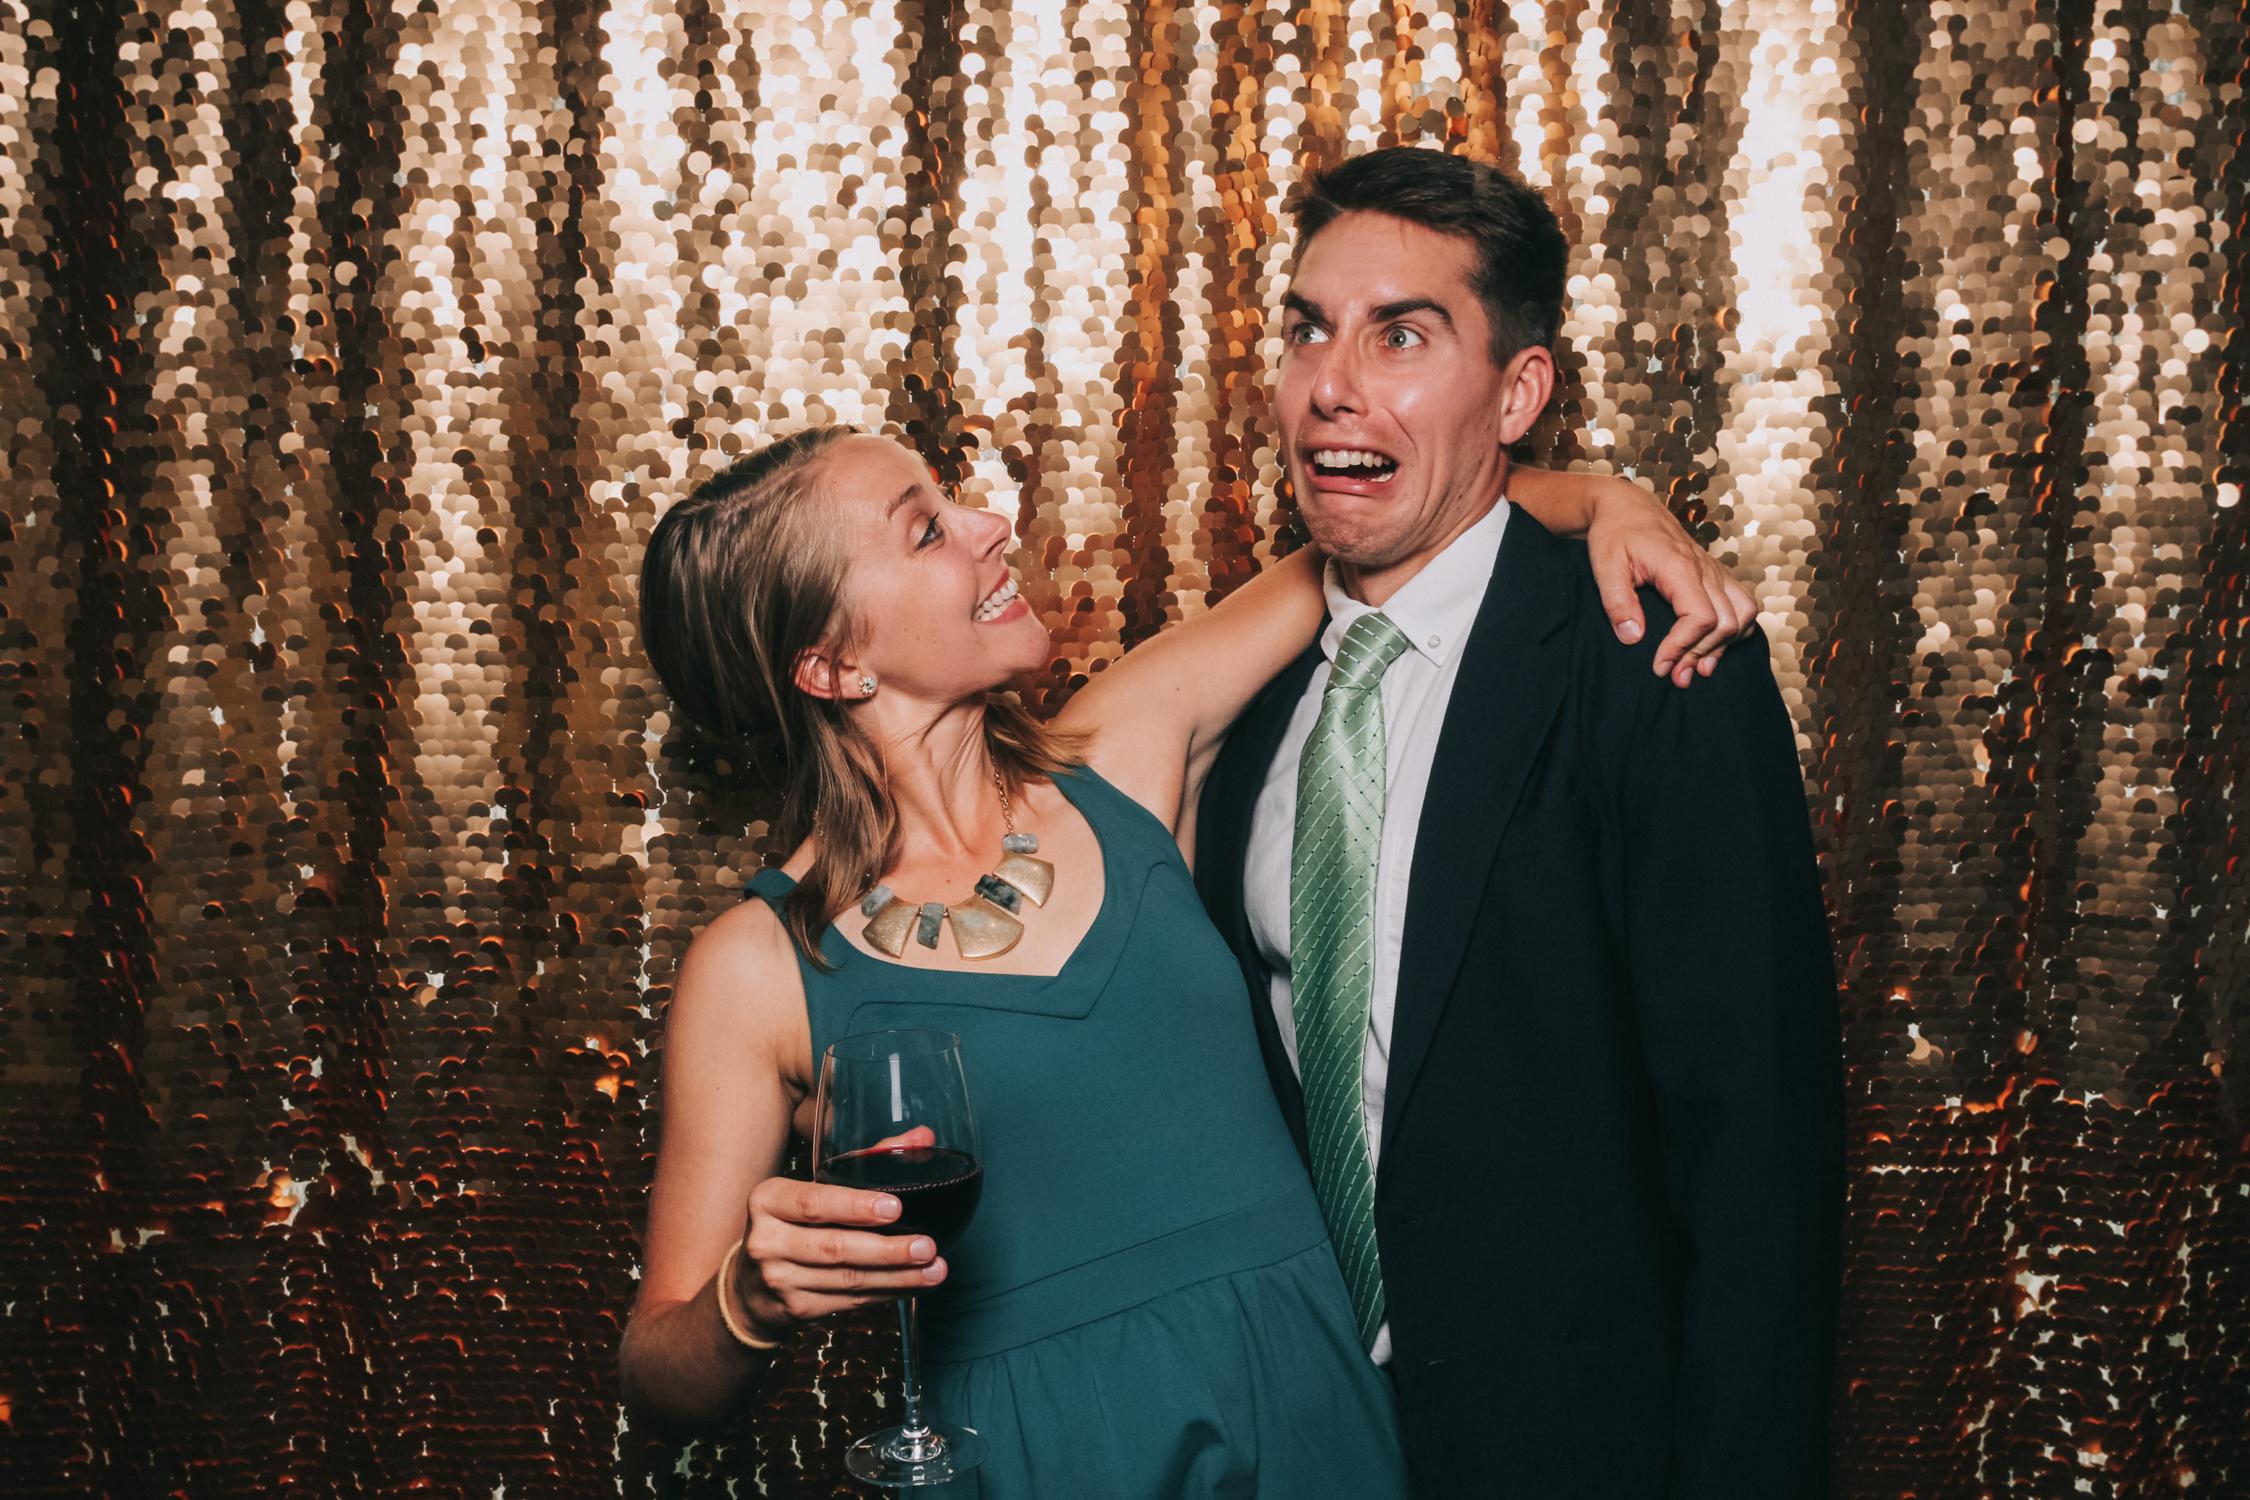 baltimore rusty scupper wedding photo booth-6.jpg